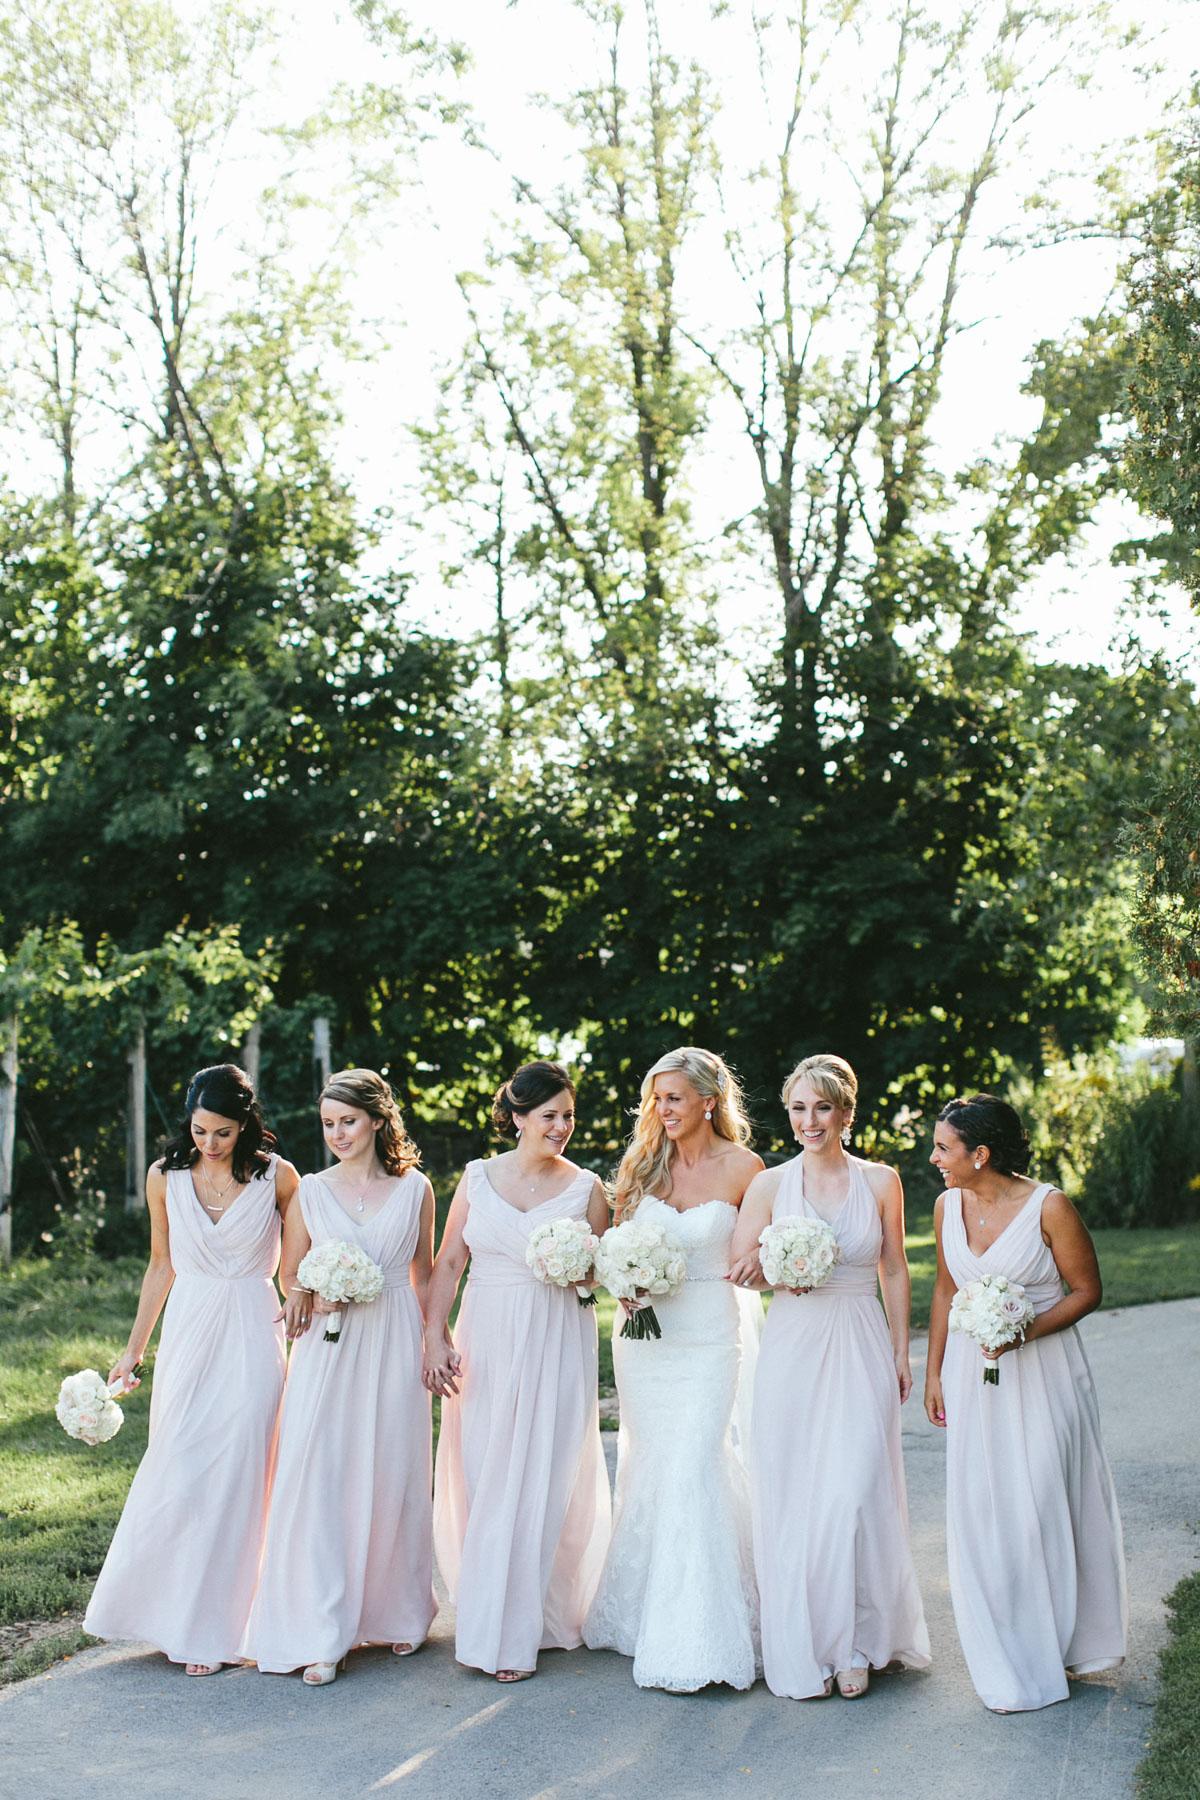 brandon-scott-photography-vineyard-bride-swish-list-stratus-vineyard-niagara-on-the-lake-wedding-21.jpg